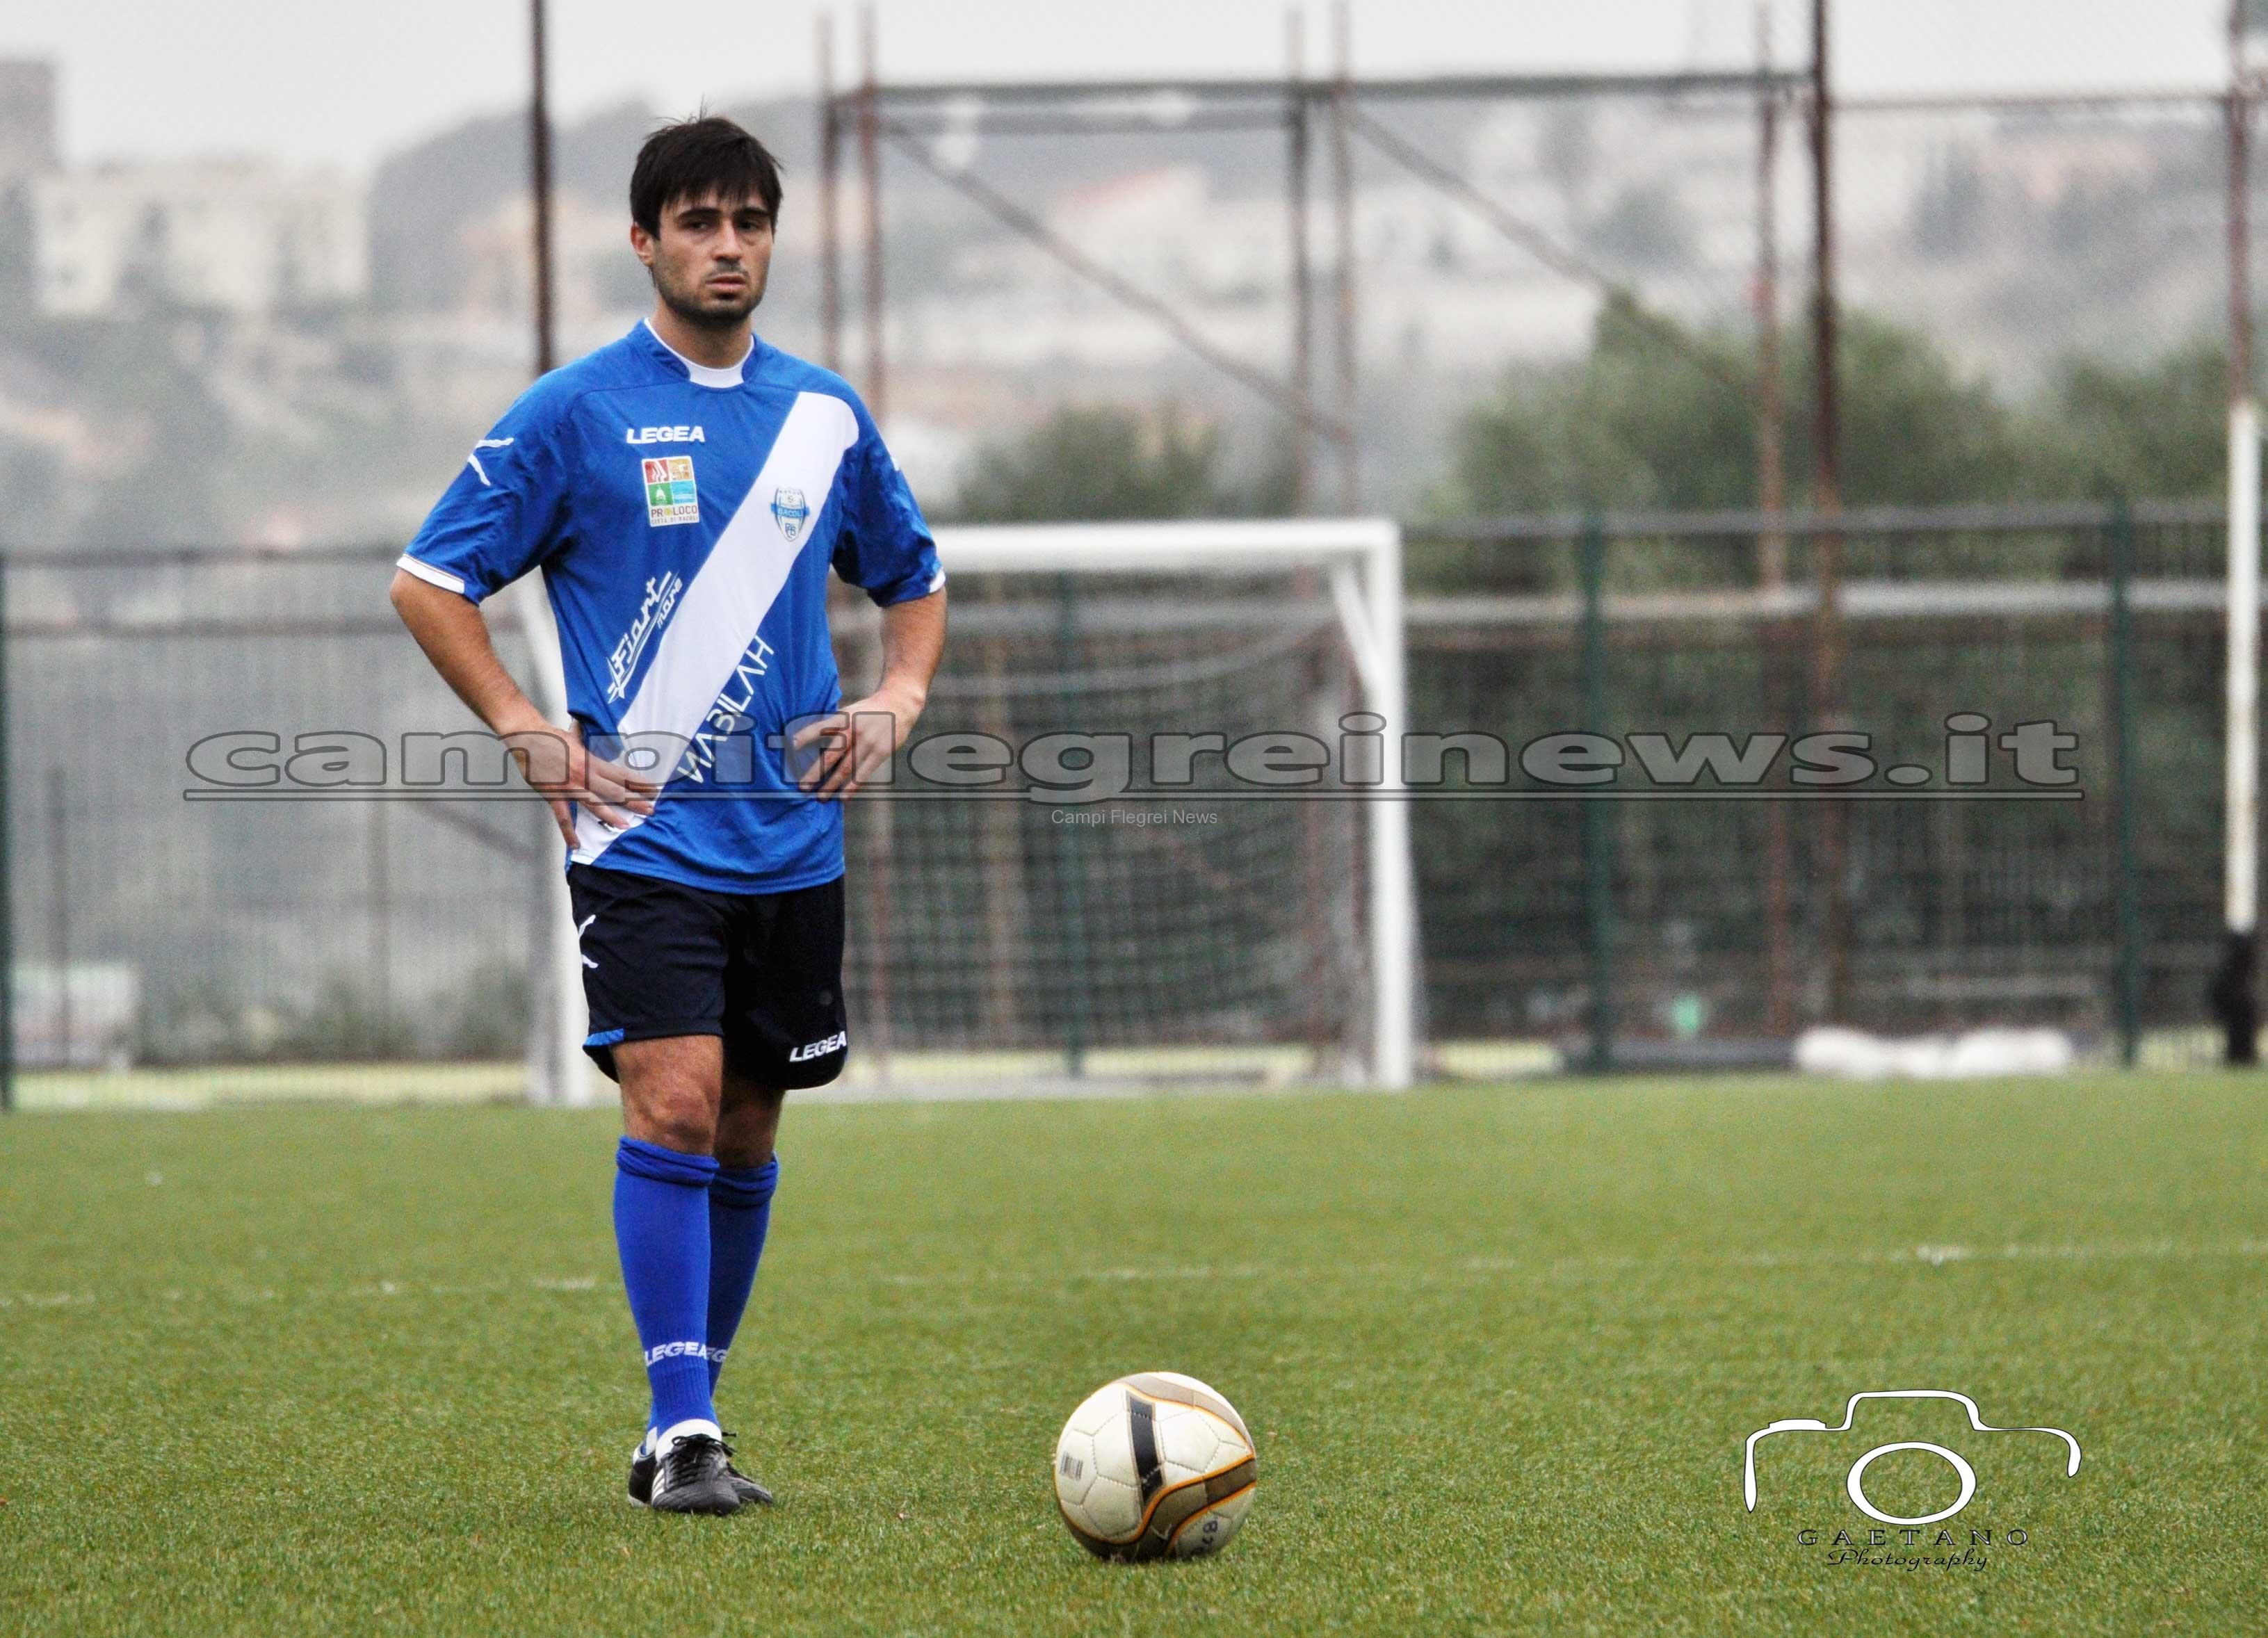 Pro Calcio Bacoli-San Giorgio - 06